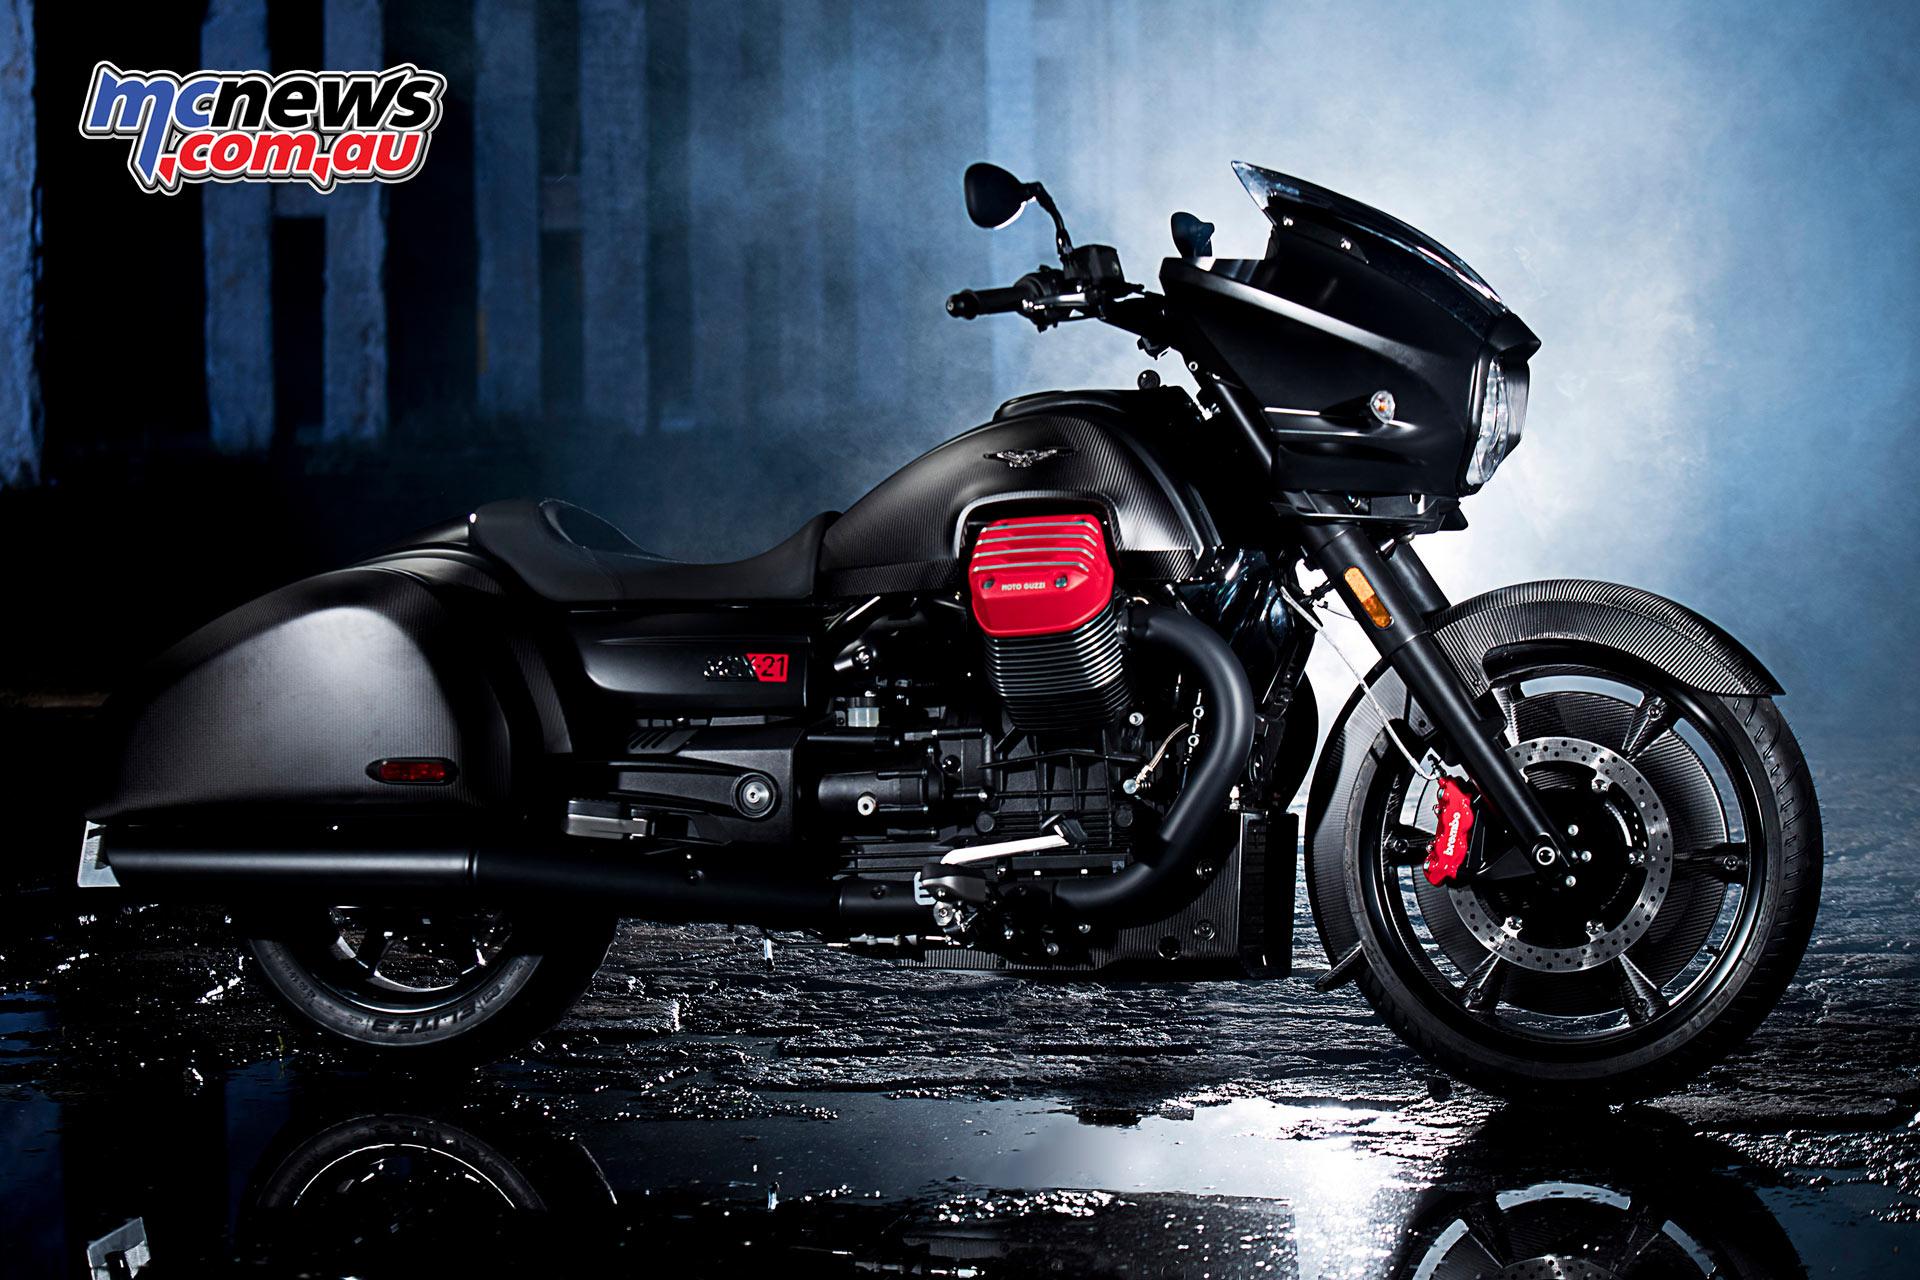 Kawasaki Enduro 650 >> Biggest brands, latest bikes at Moto Expo 2016 | MCNews.com.au